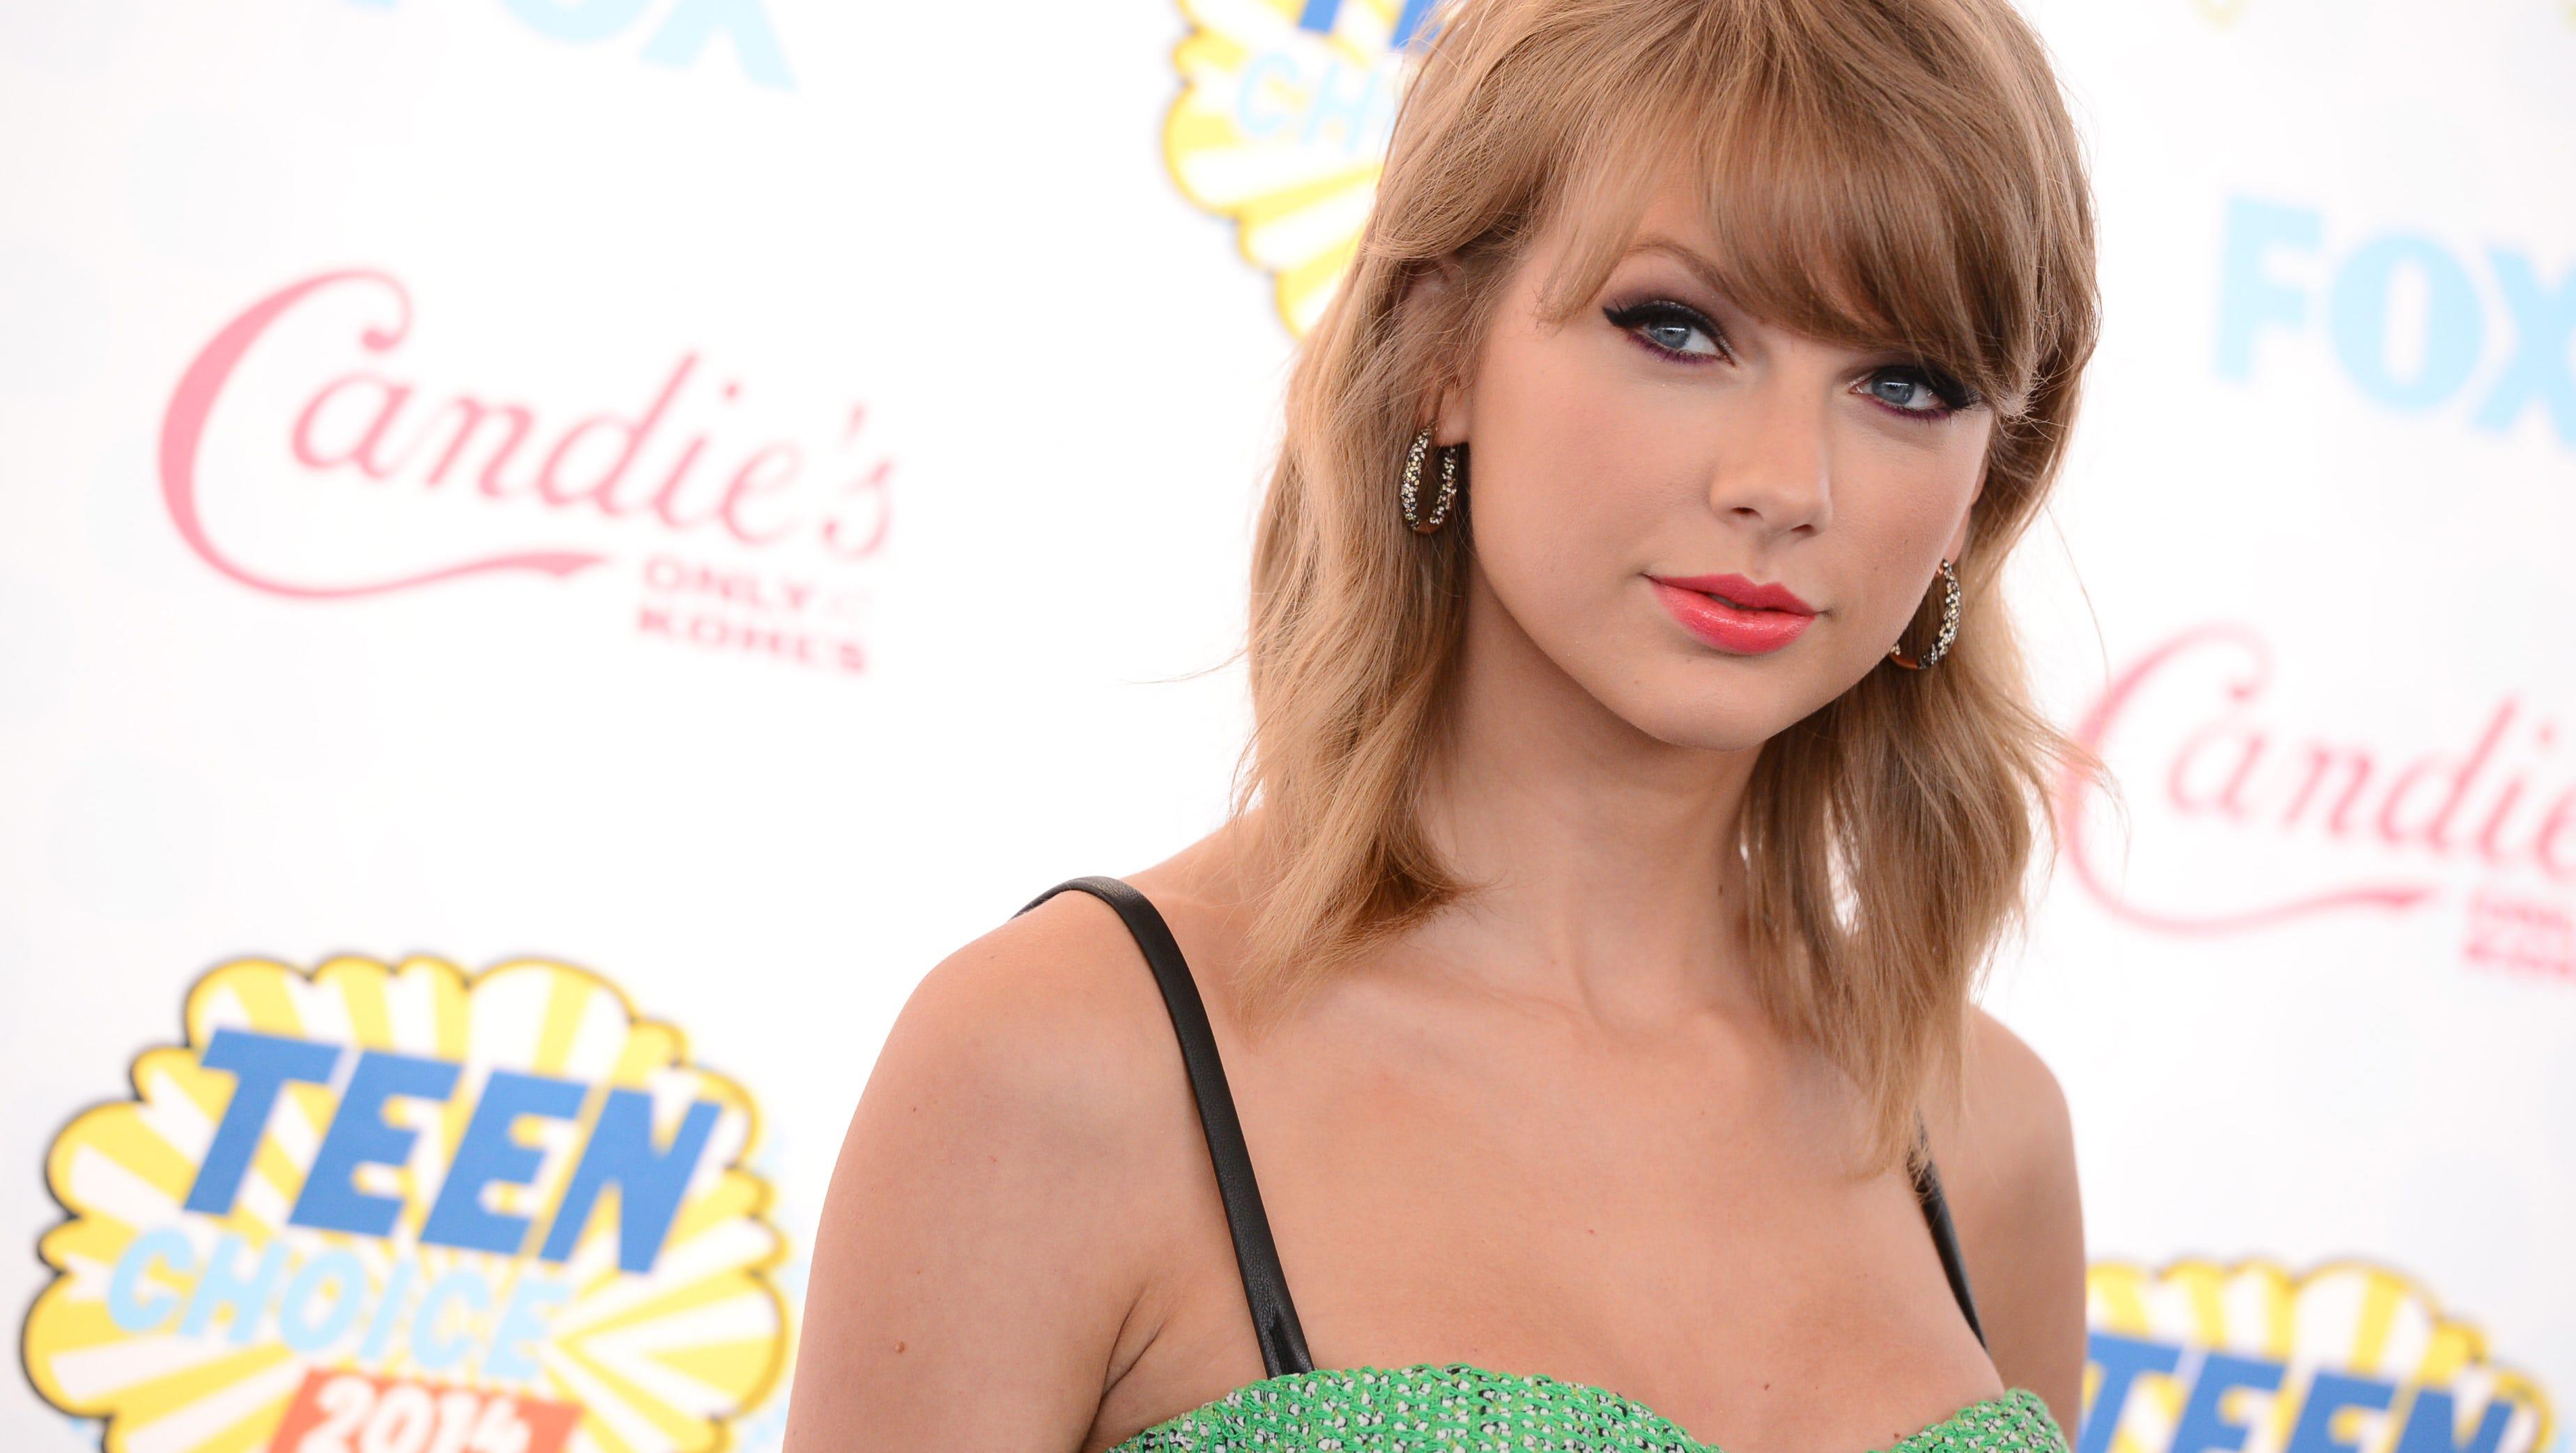 Taylor Swift Debuts Shake It Off Reveals 1989 Album